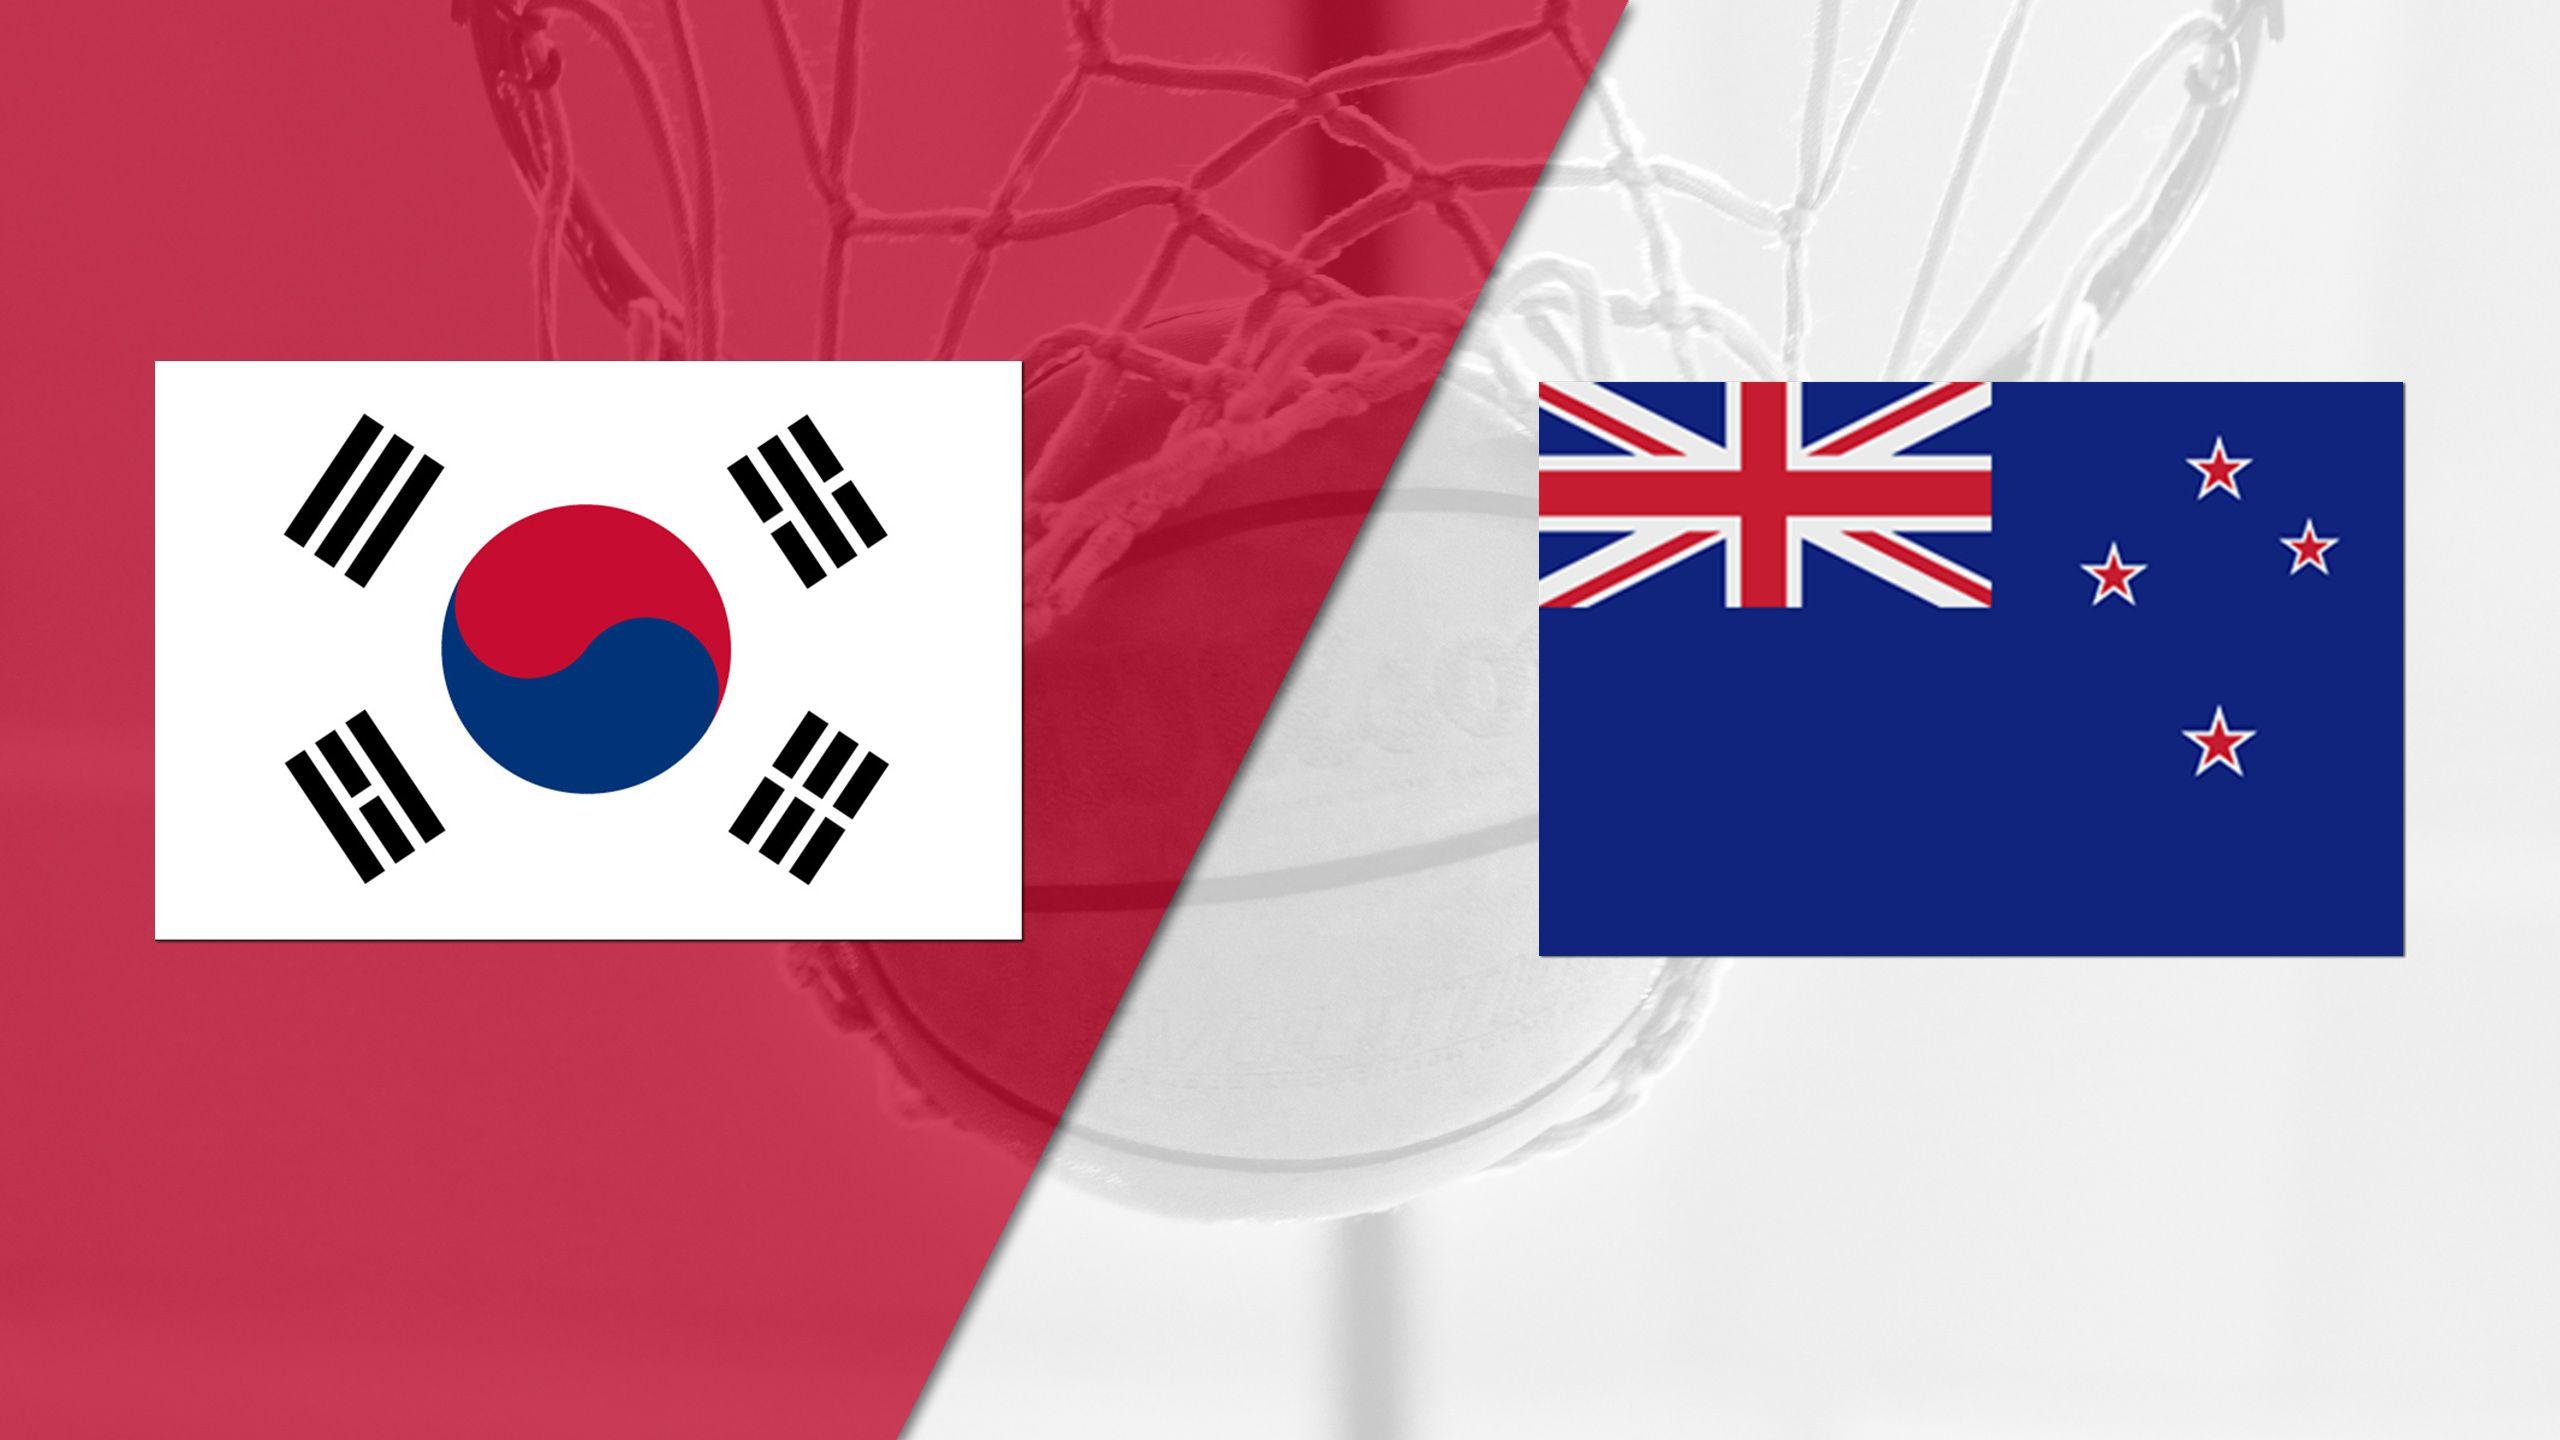 Korea vs. New Zealand (FIBA World Cup 2019 Qualifier)